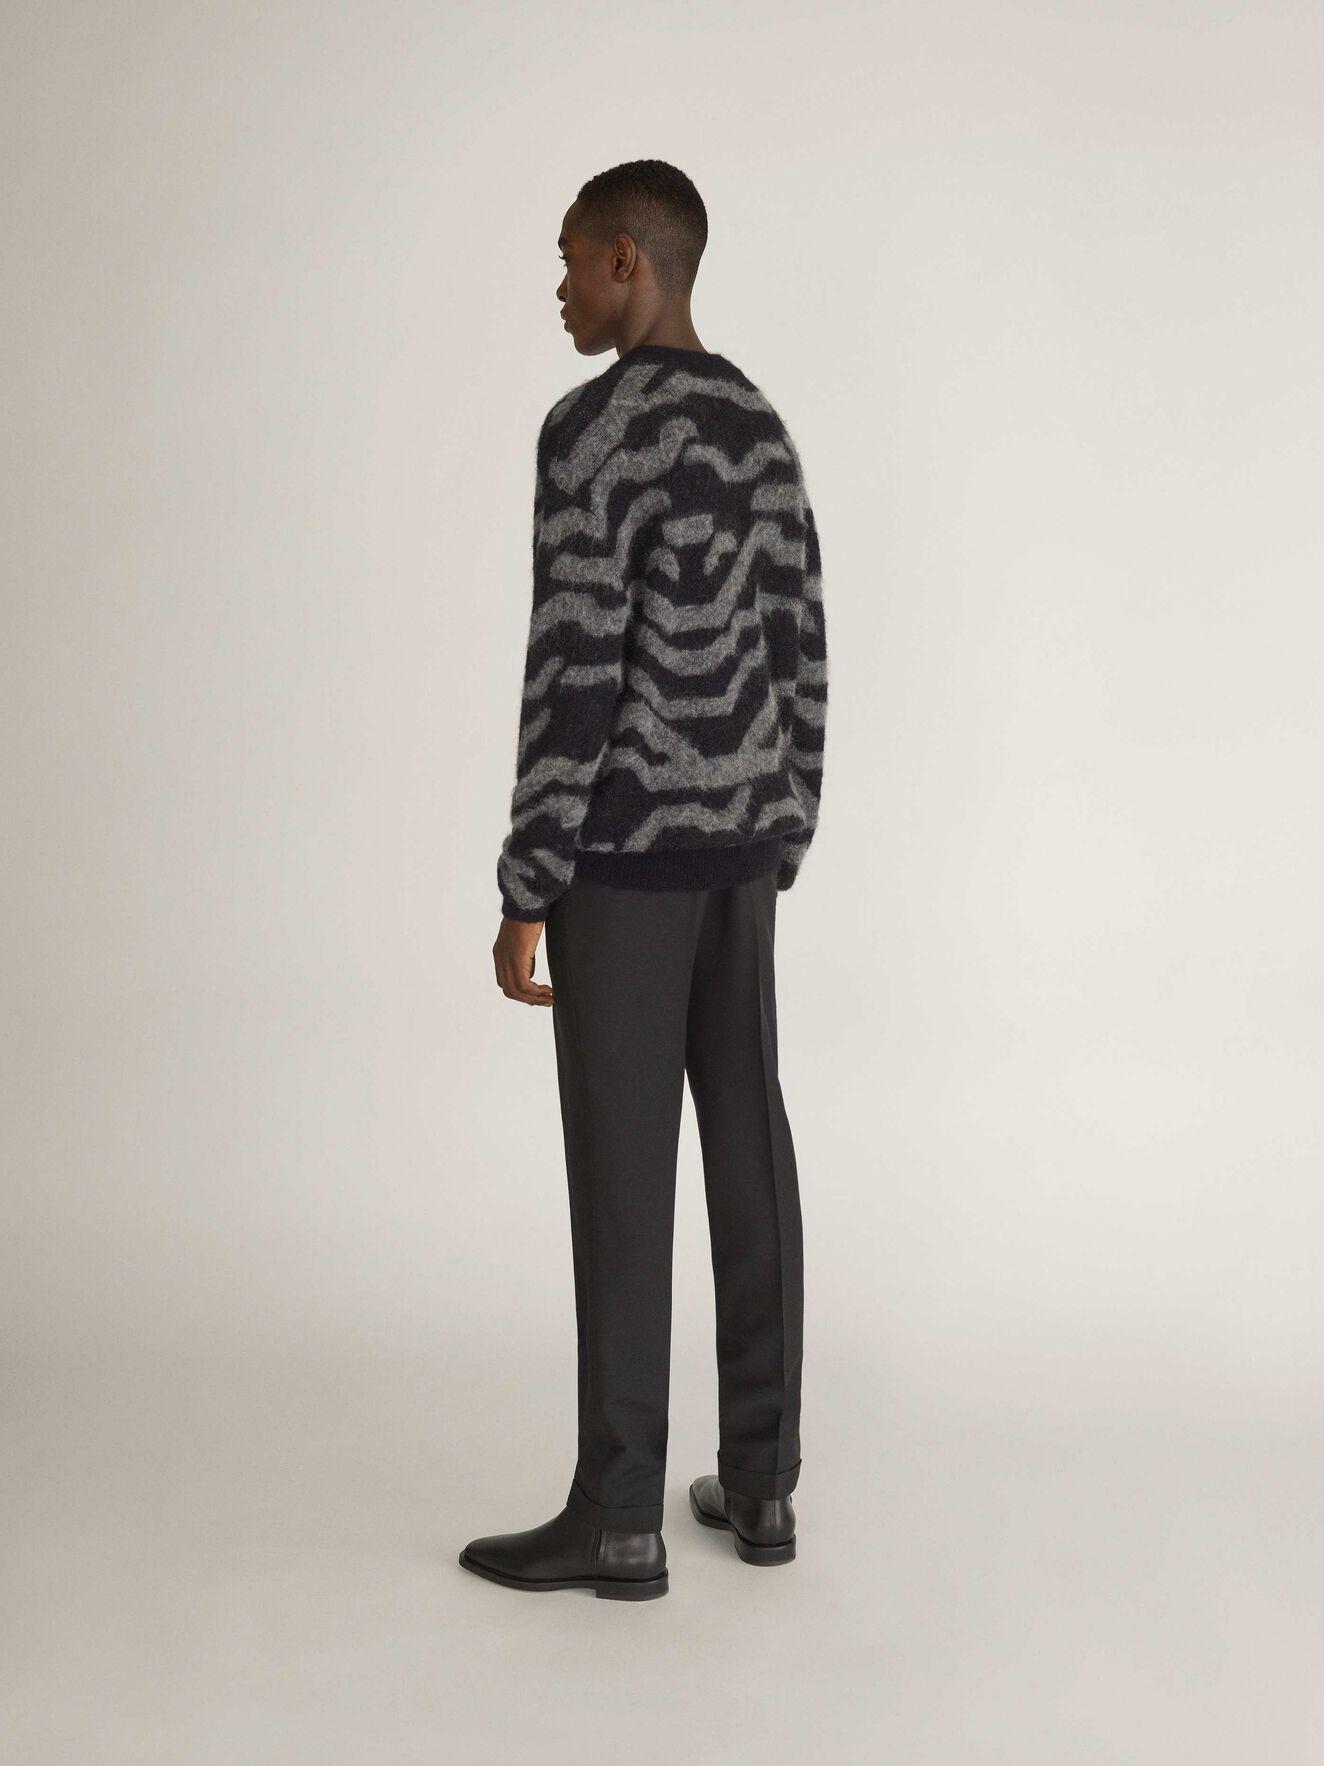 Nocks Pullover in Black from Tiger of Sweden